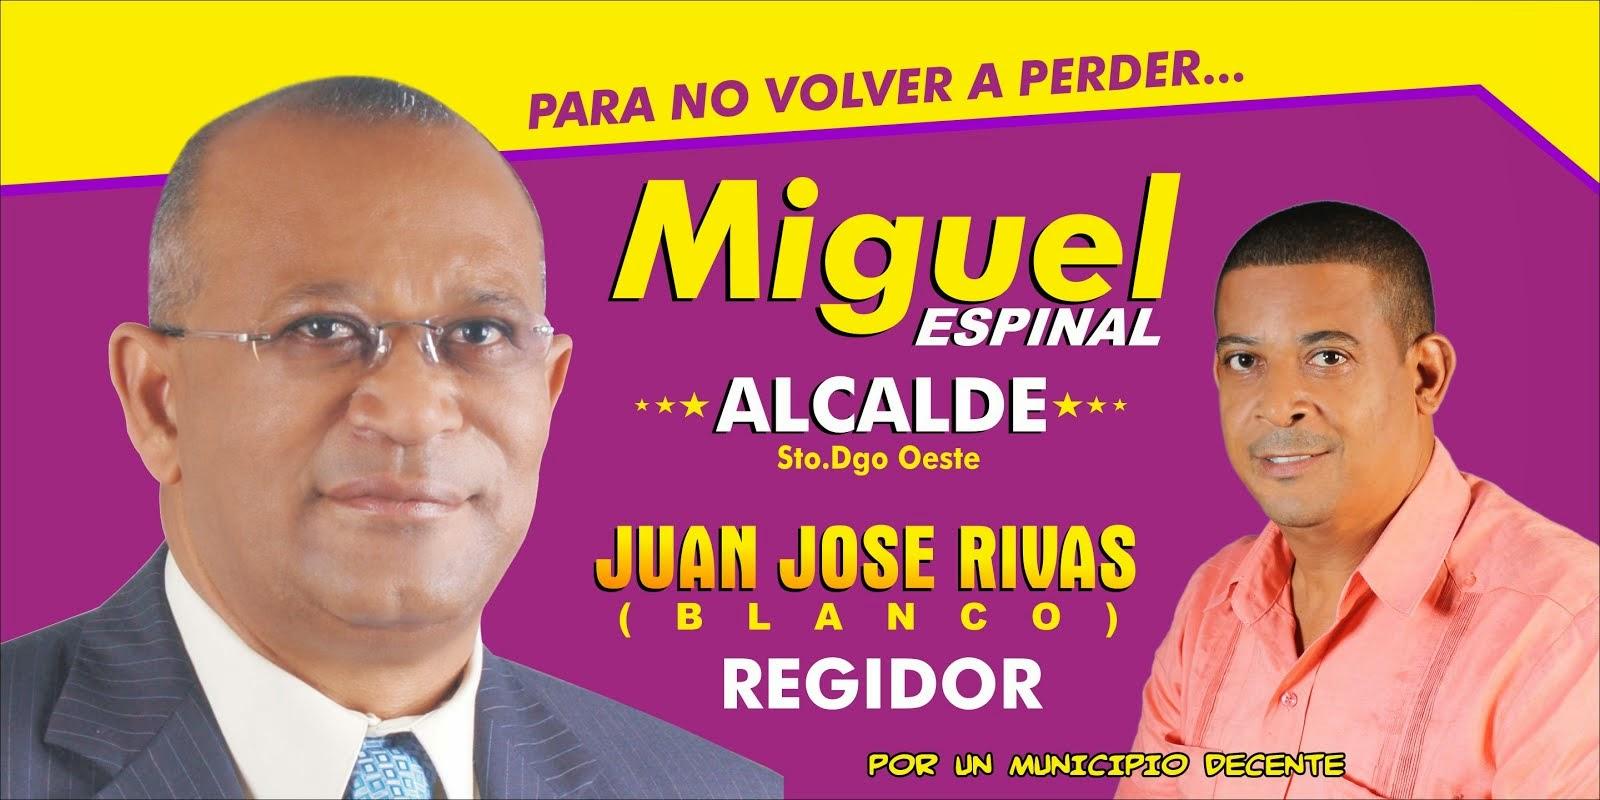 BLANCO RIVAS REGIDOR